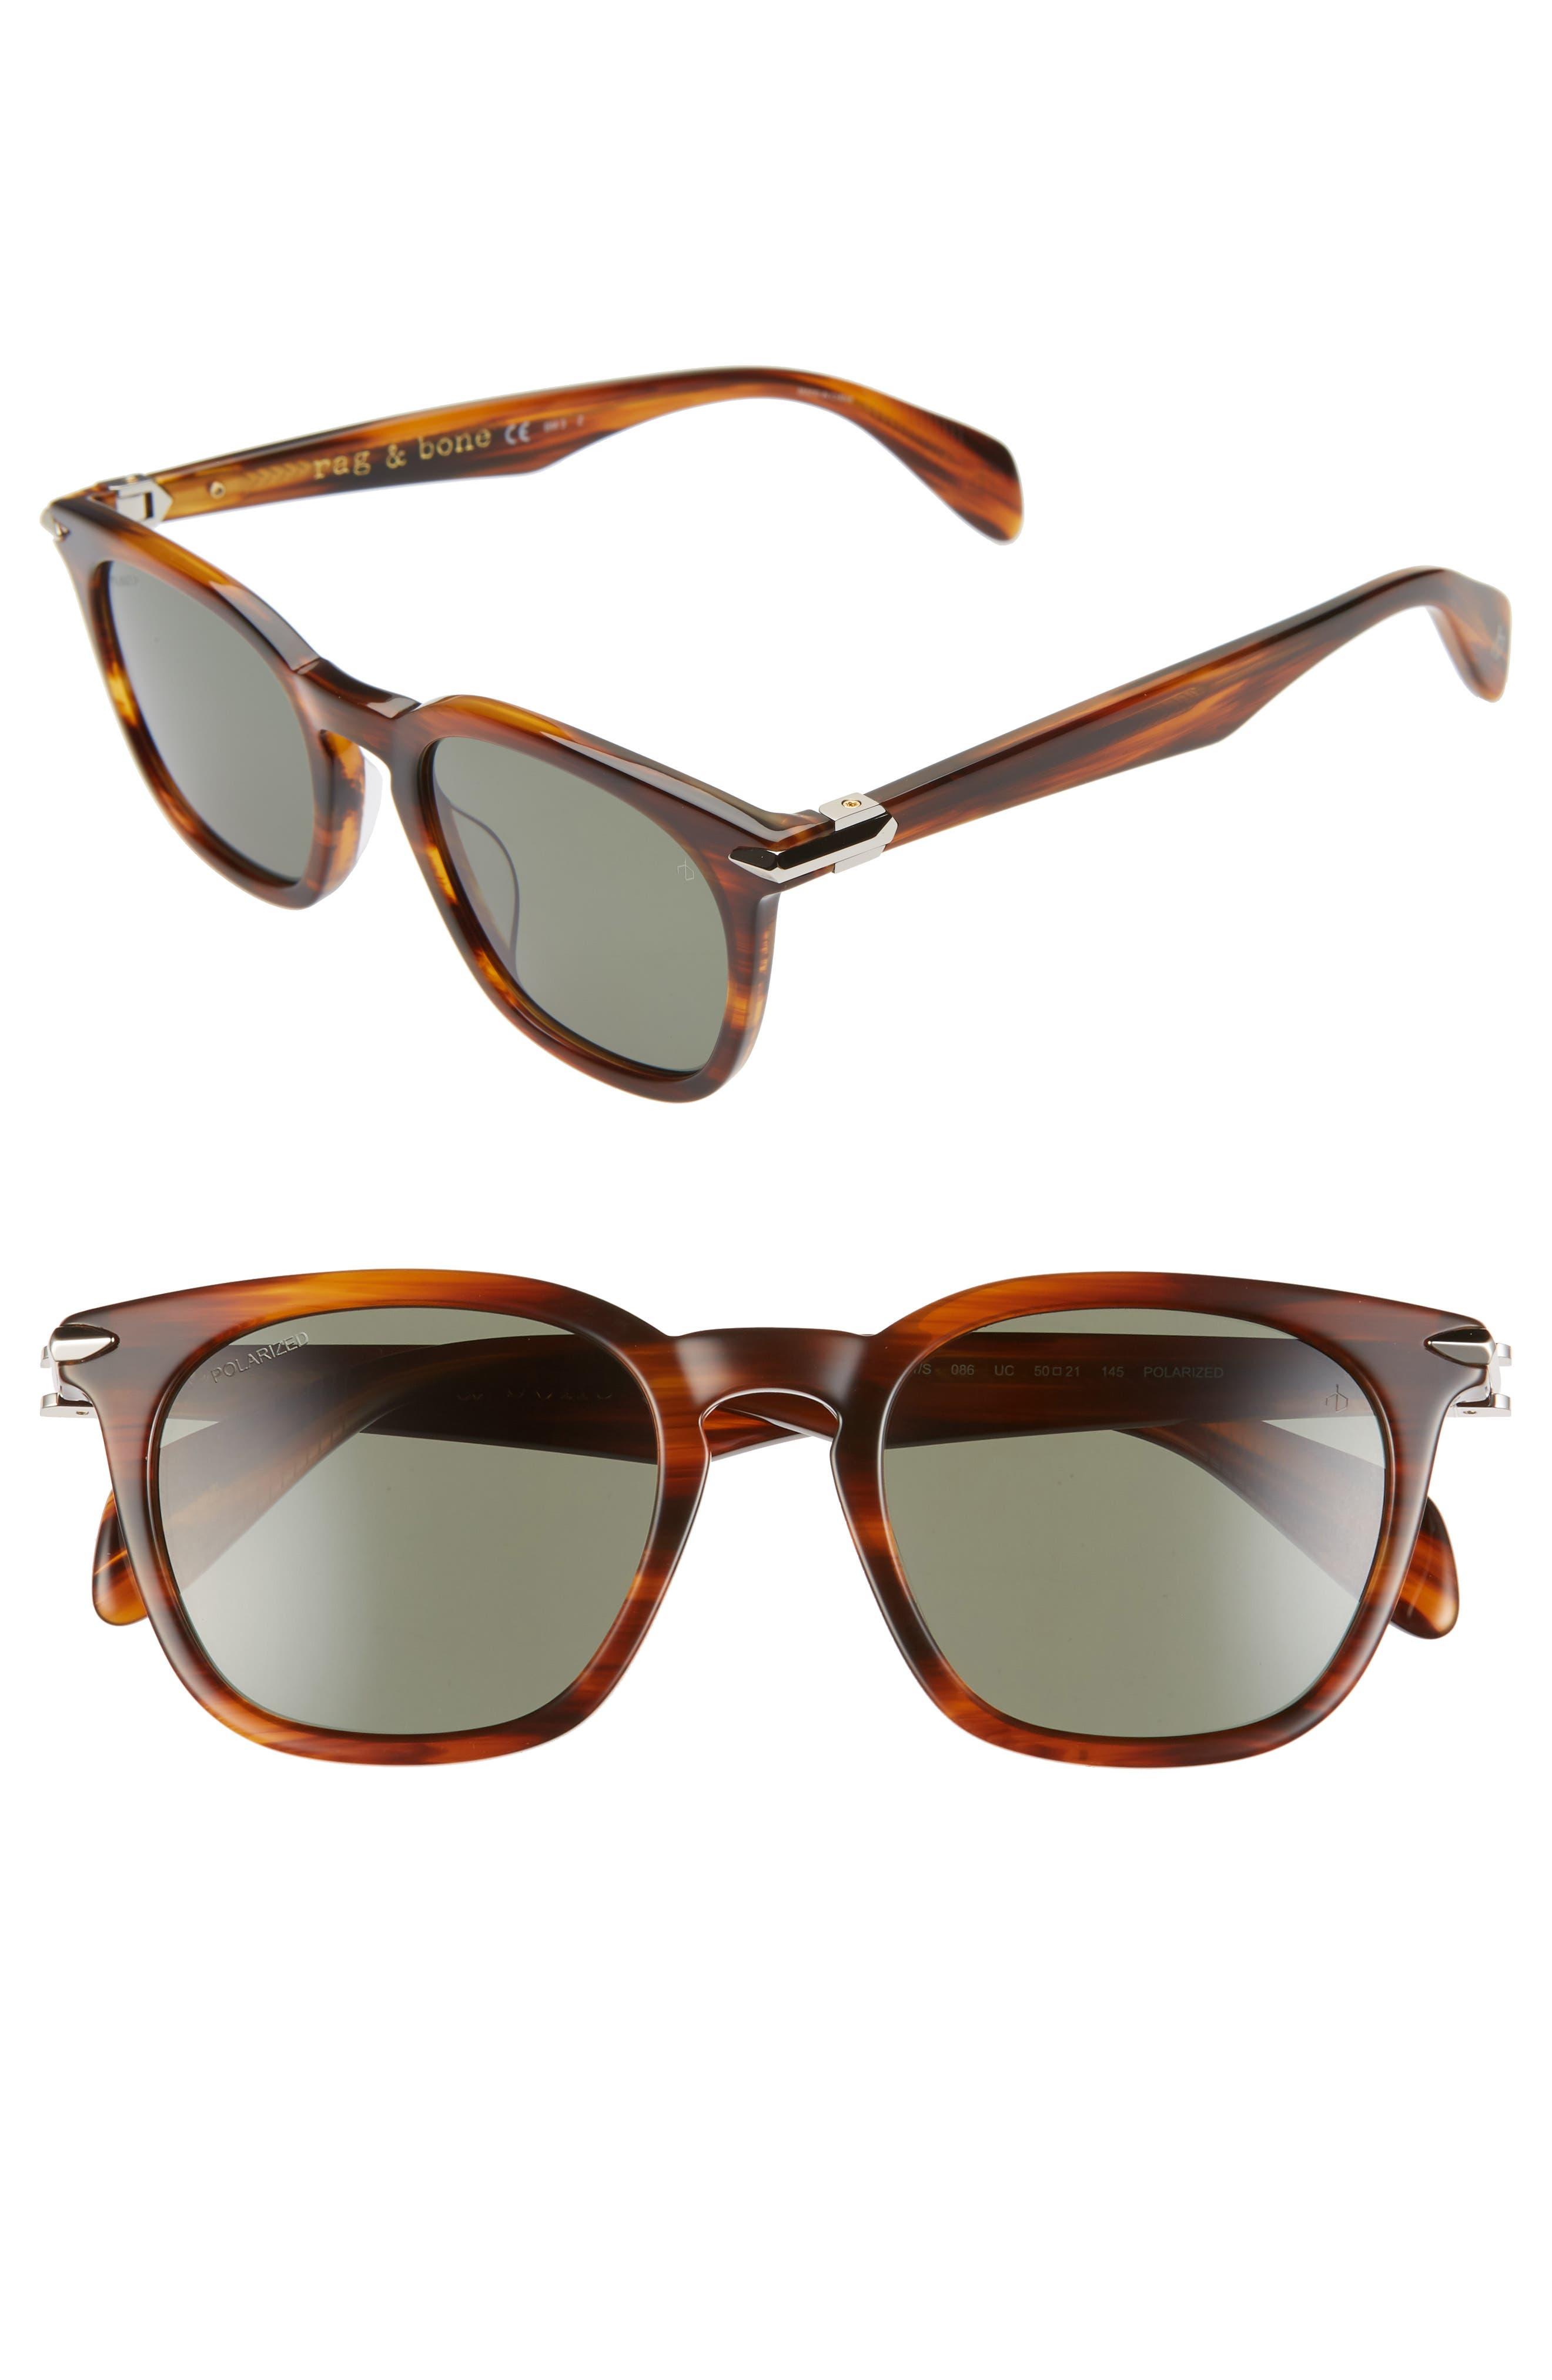 1950 Style Clothing- A Shopping Guide Mens Rag  Bone 50Mm Polarized Sunglasses - Dark Havana $255.00 AT vintagedancer.com